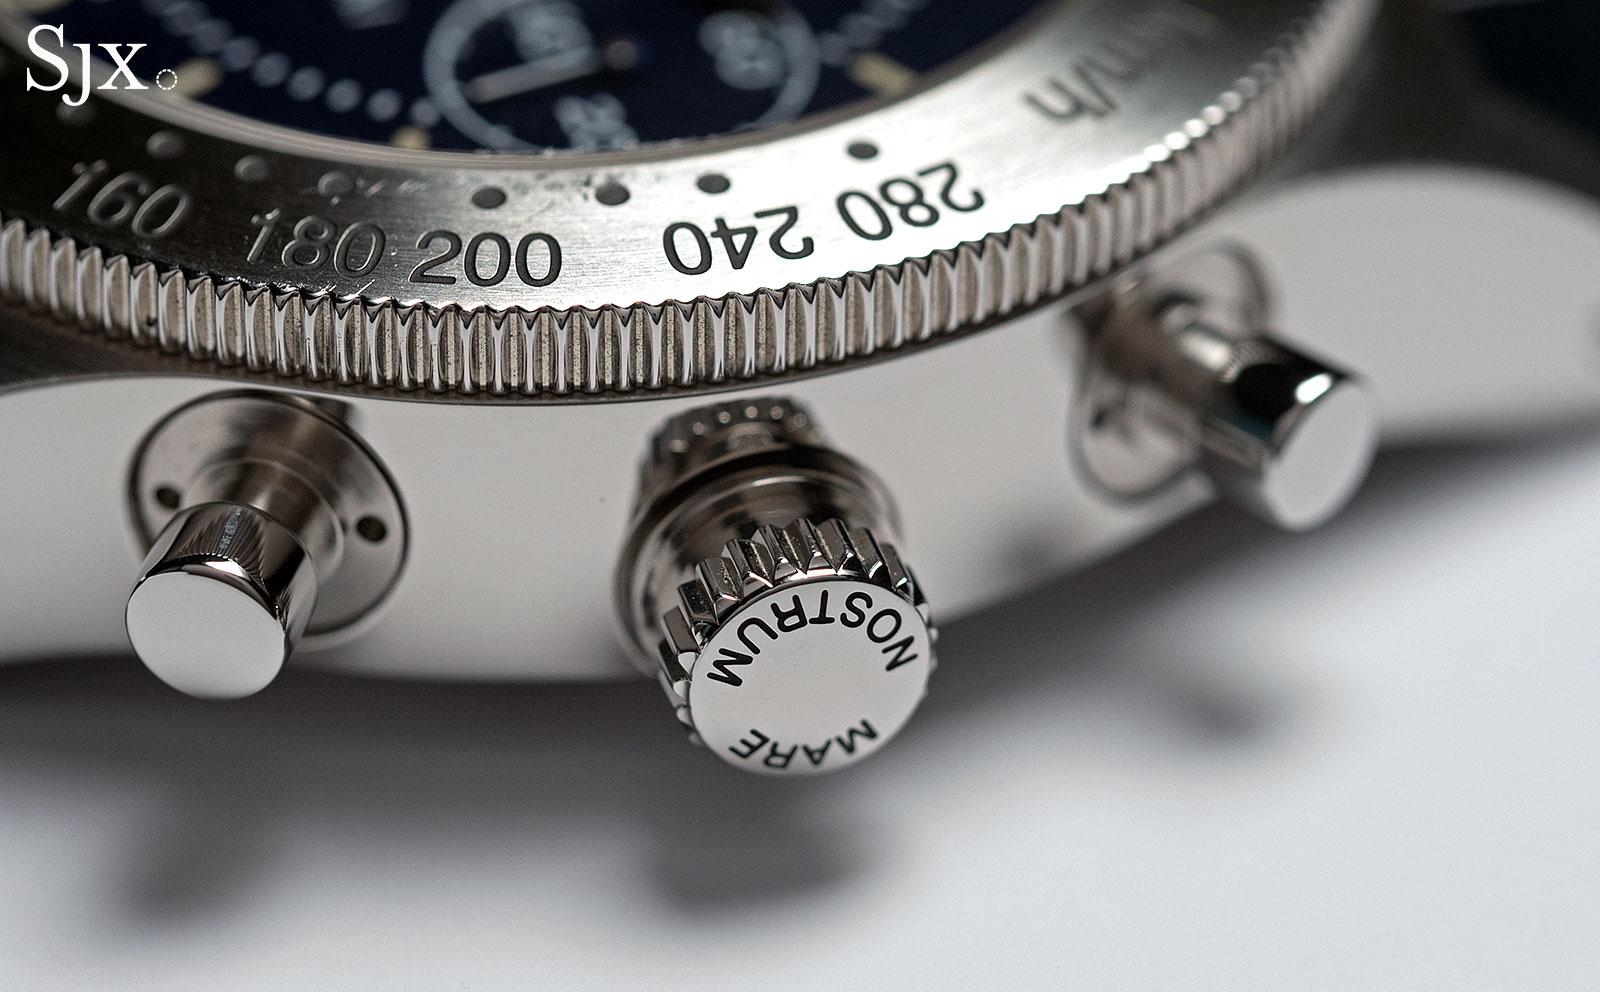 Panerai Mare Nostrum PAM 716 chrono 5